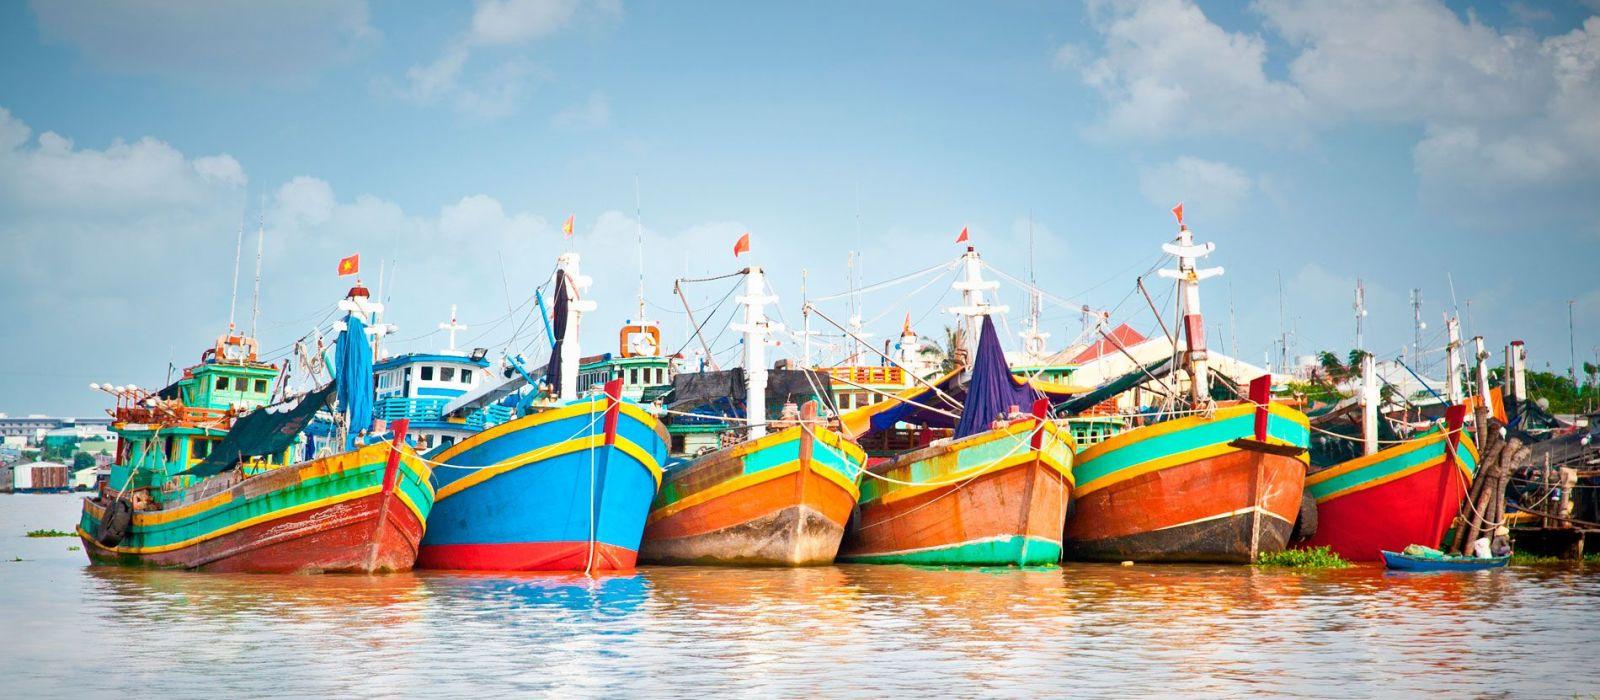 Destination My Tho / Mekong Delta Vietnam